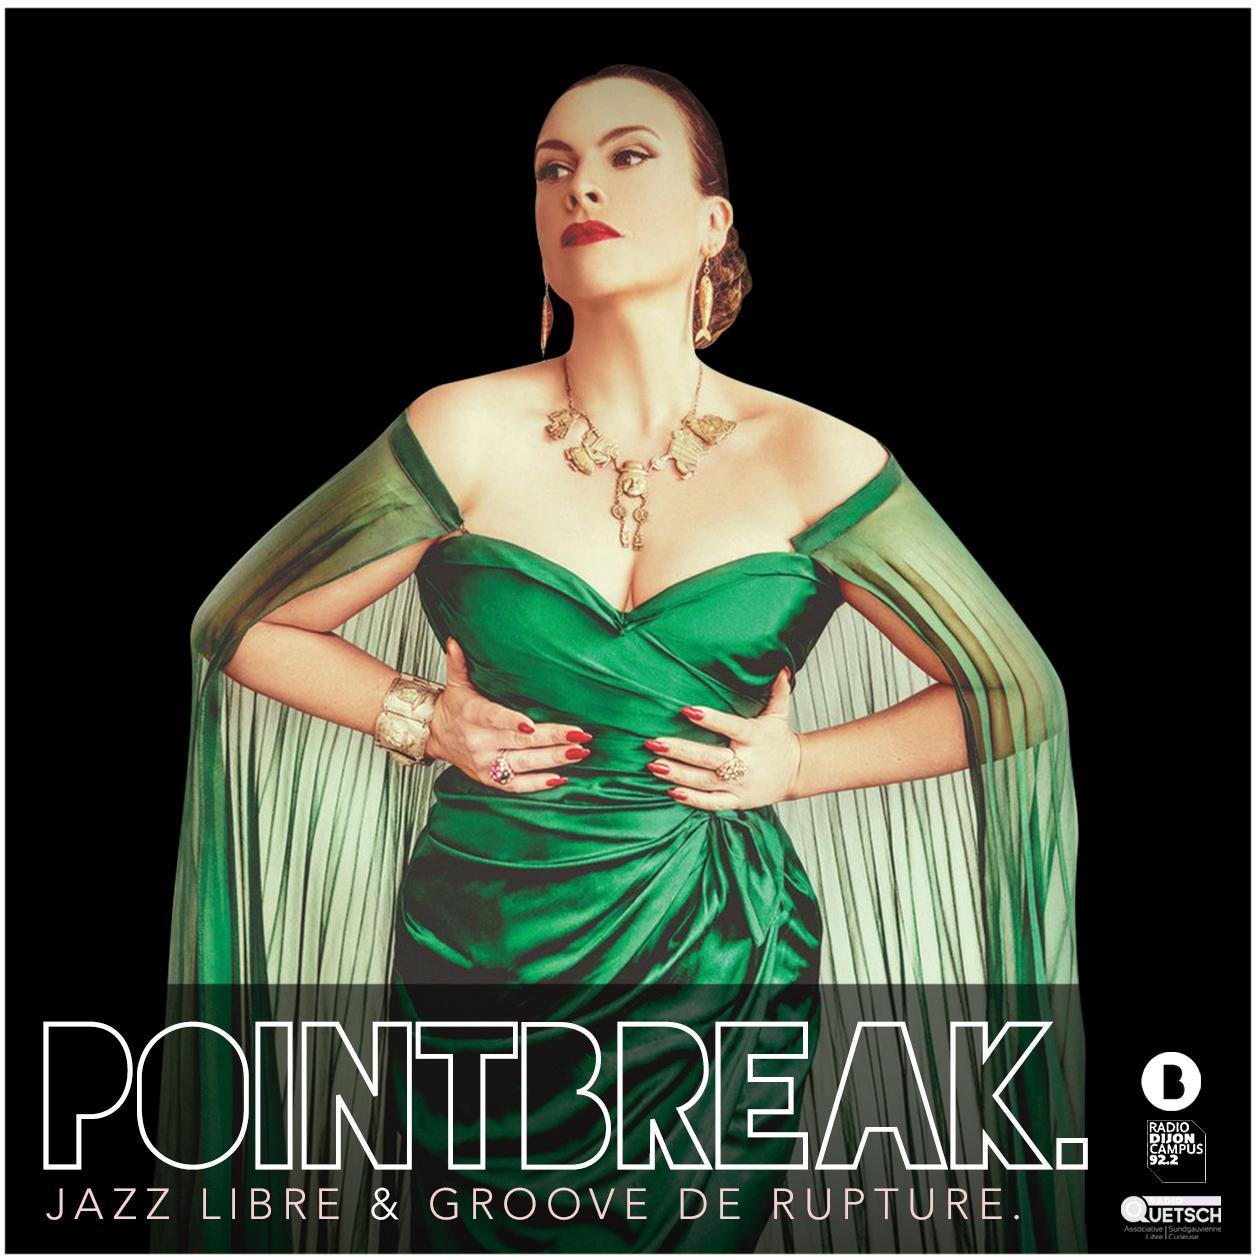 PointBreak, Radio Mix S03 E03